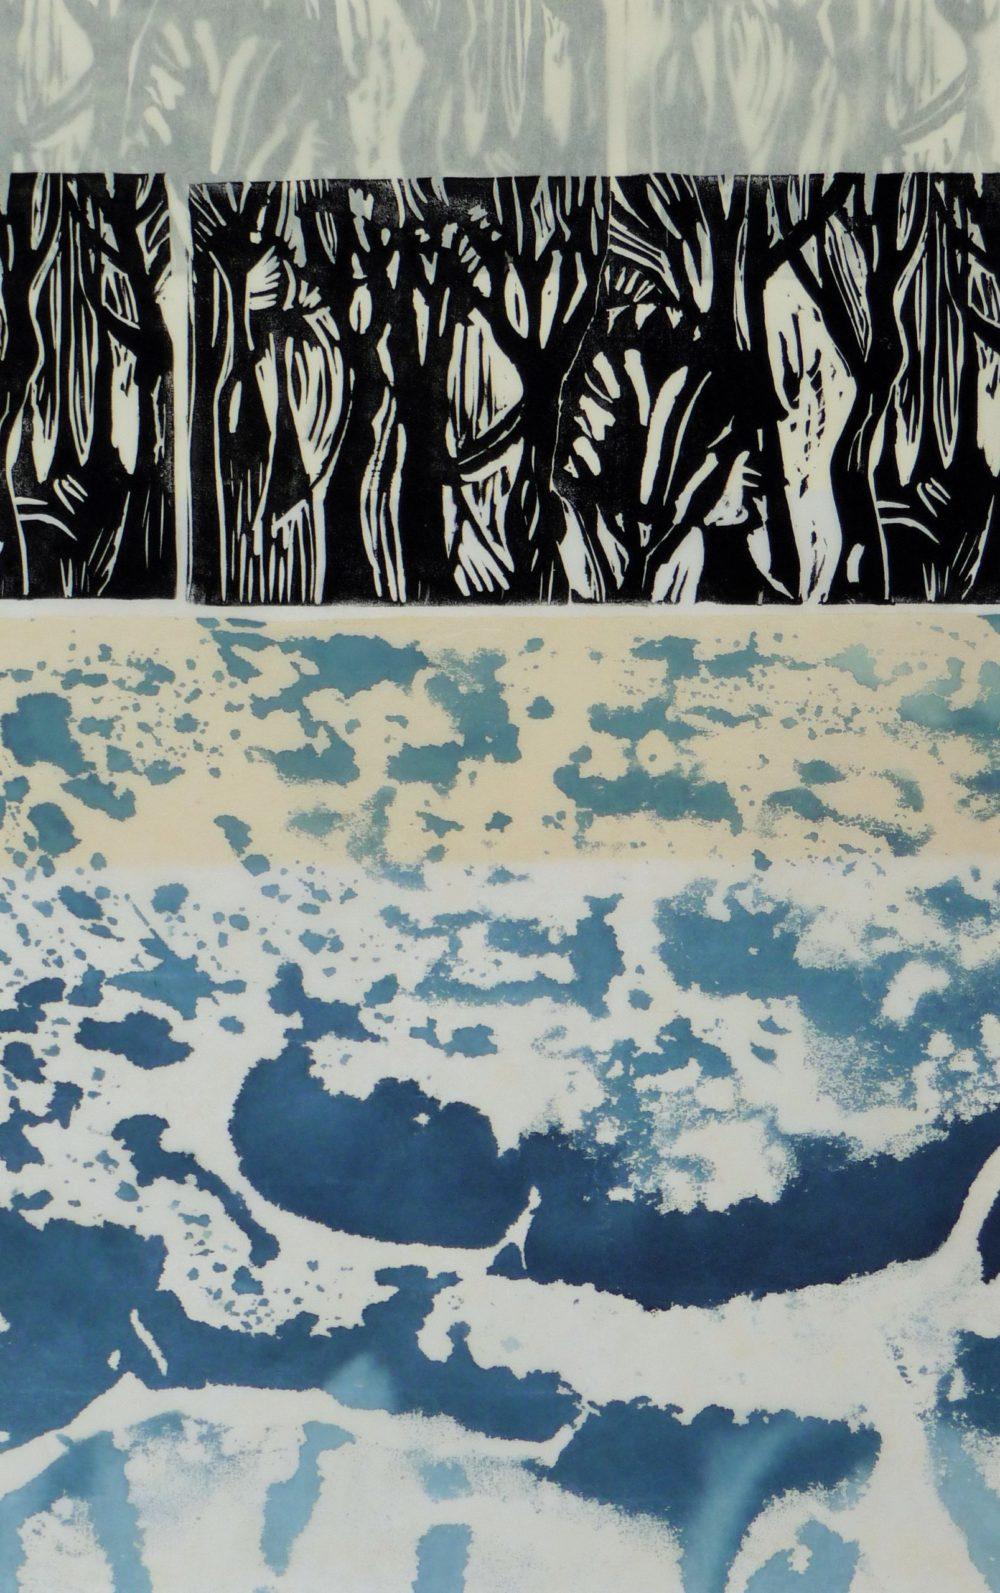 Forest and Ice - Dominique Prevost